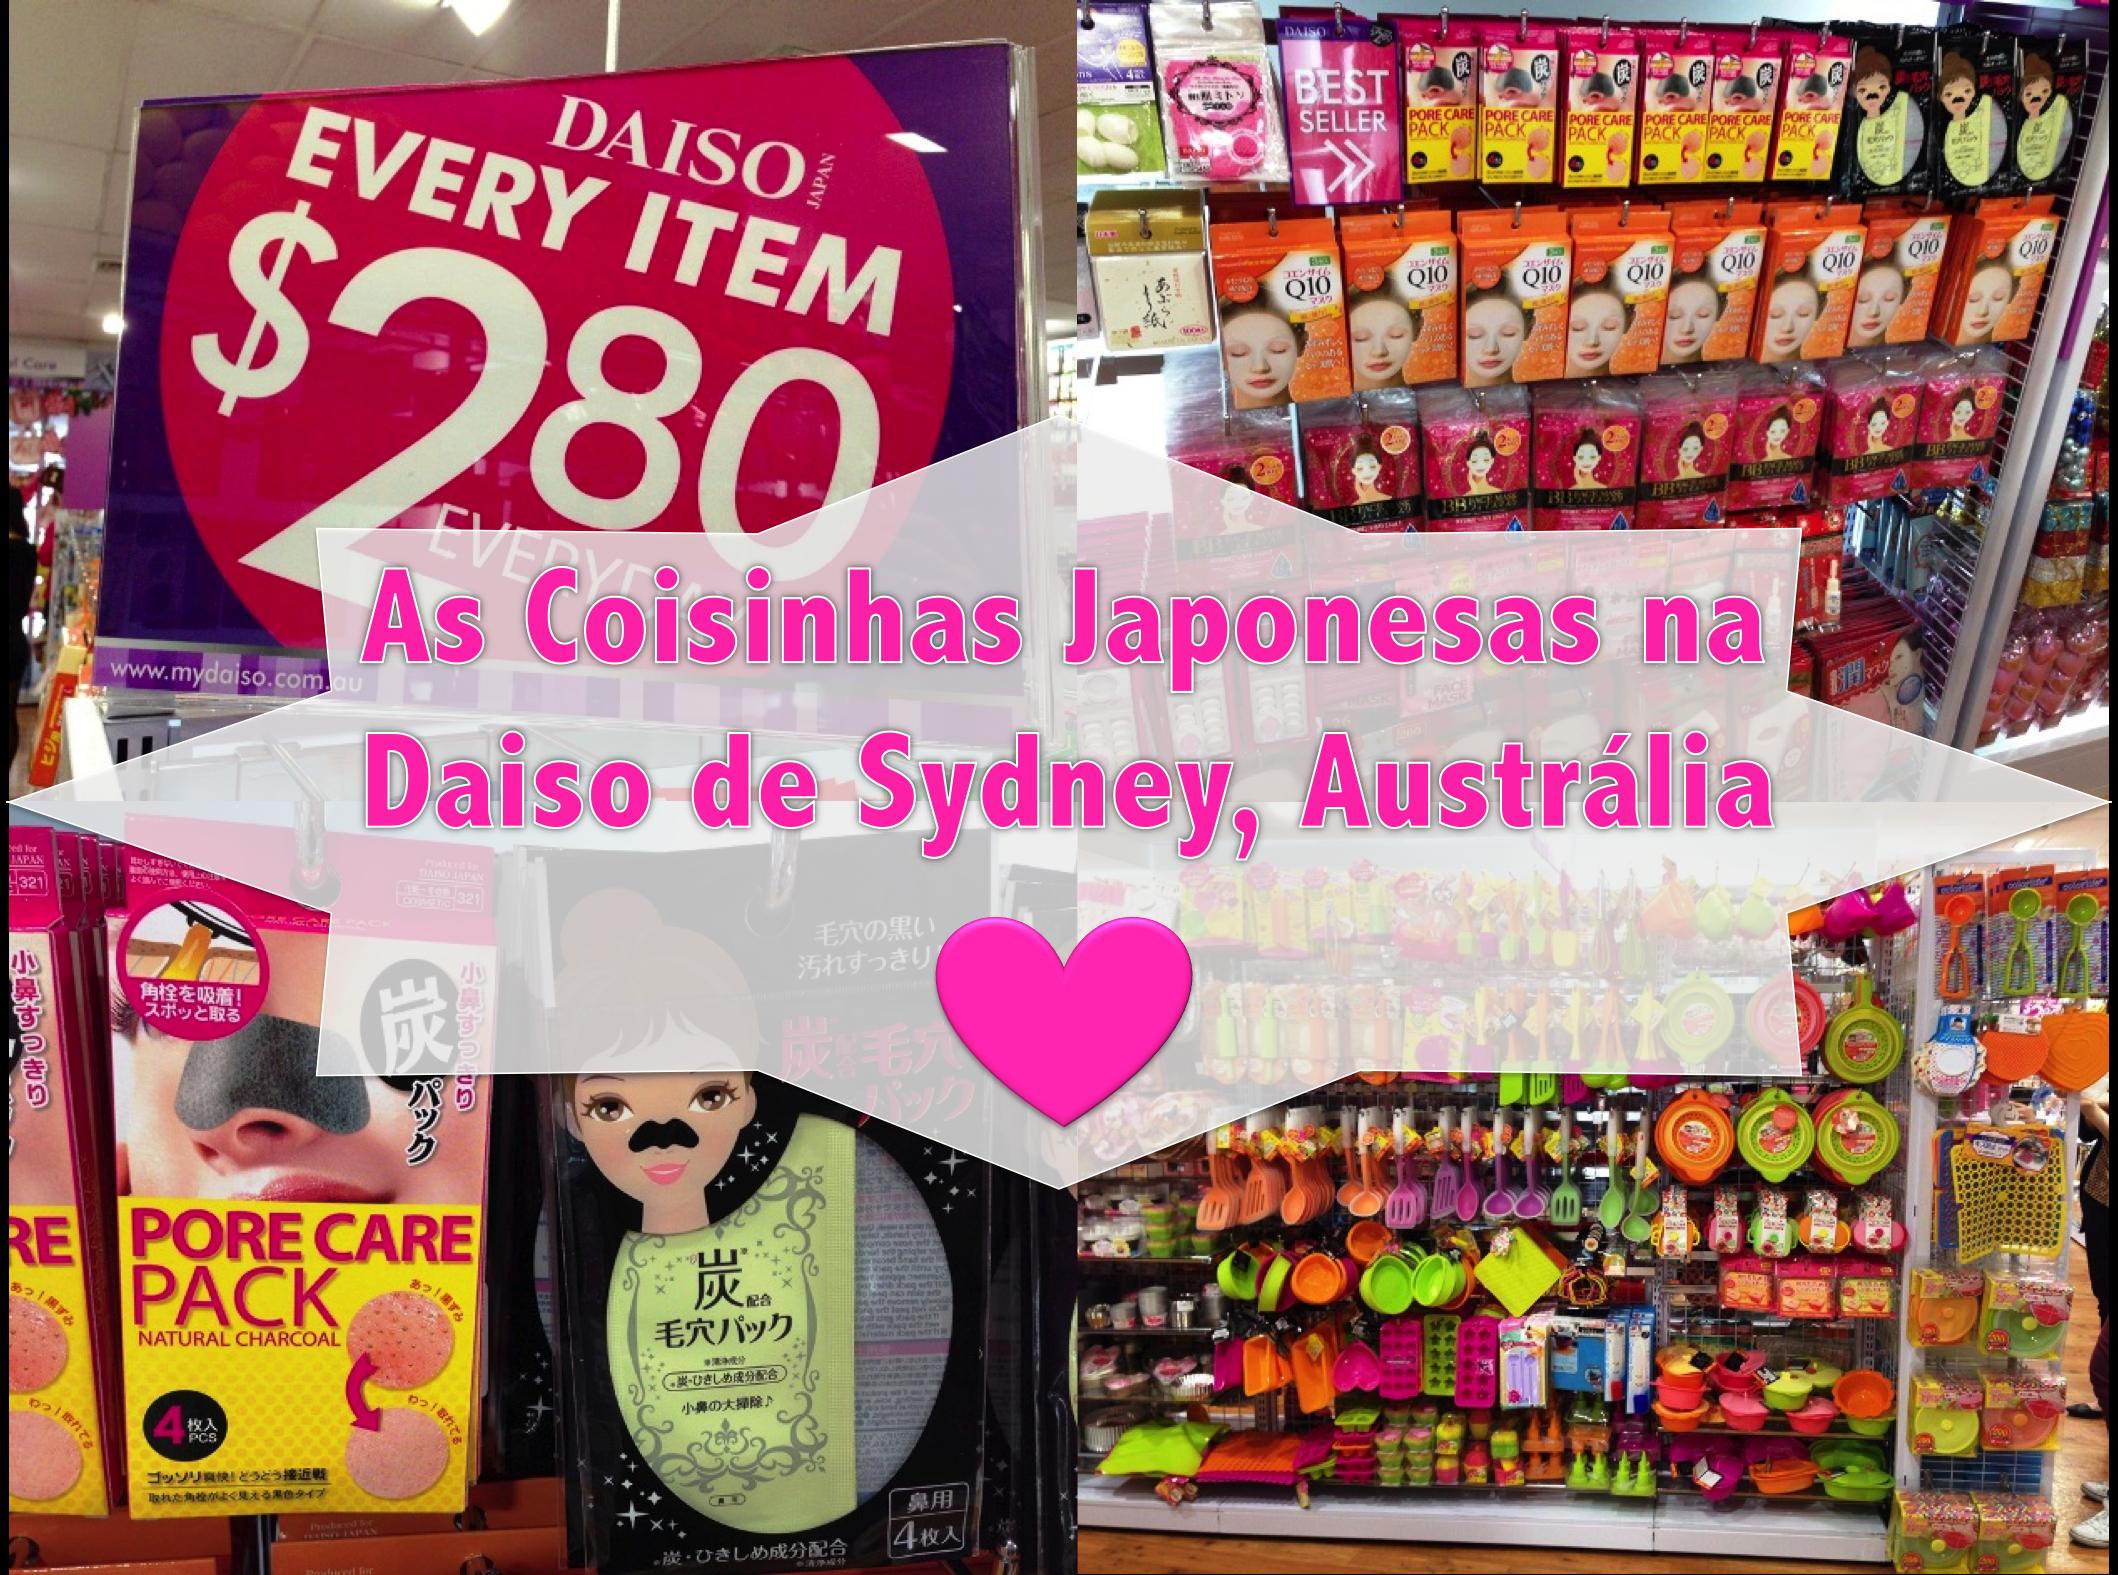 loja daiso, daiso japan, daiso, australia, sydney, acho tendencia